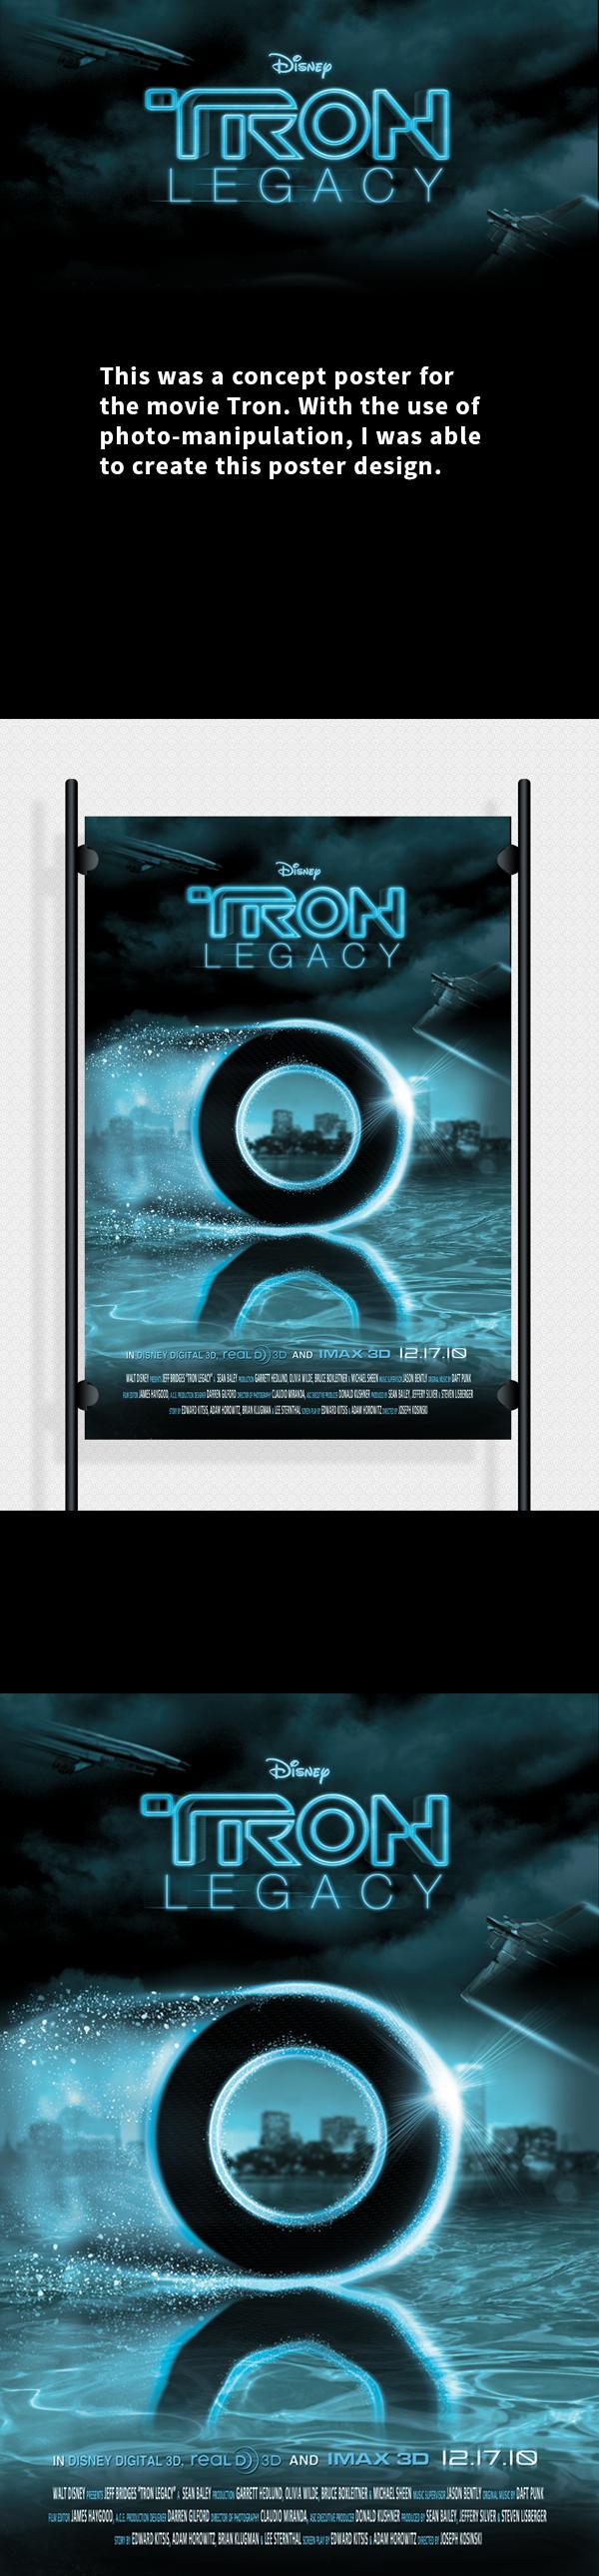 Tron movie poster shop